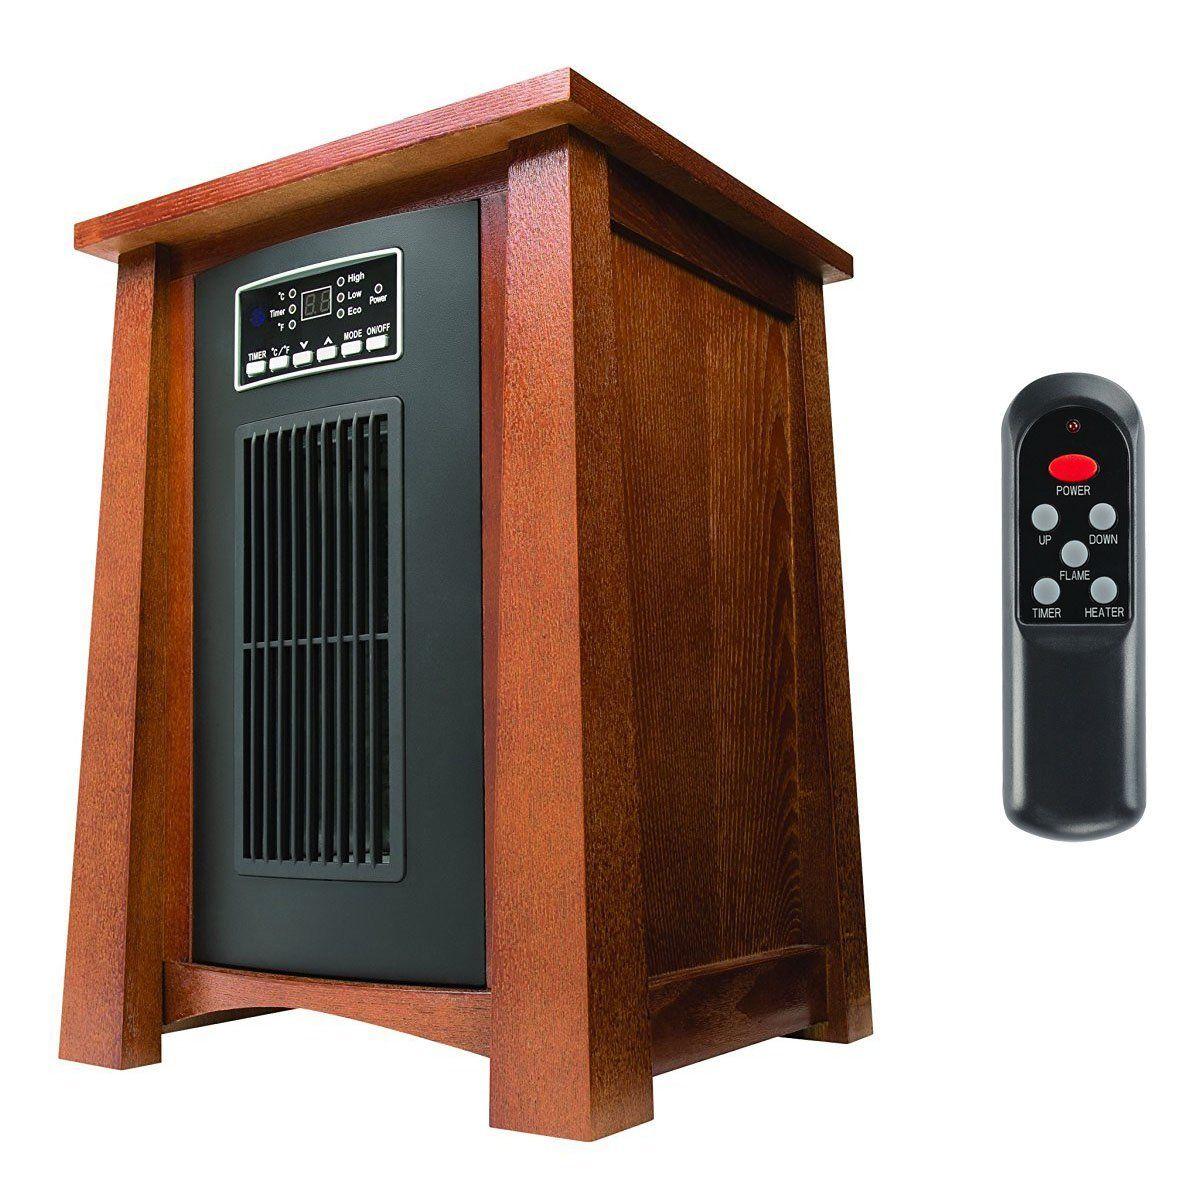 Dark Oak Infrared Zone Heater With 3 Heat Settings